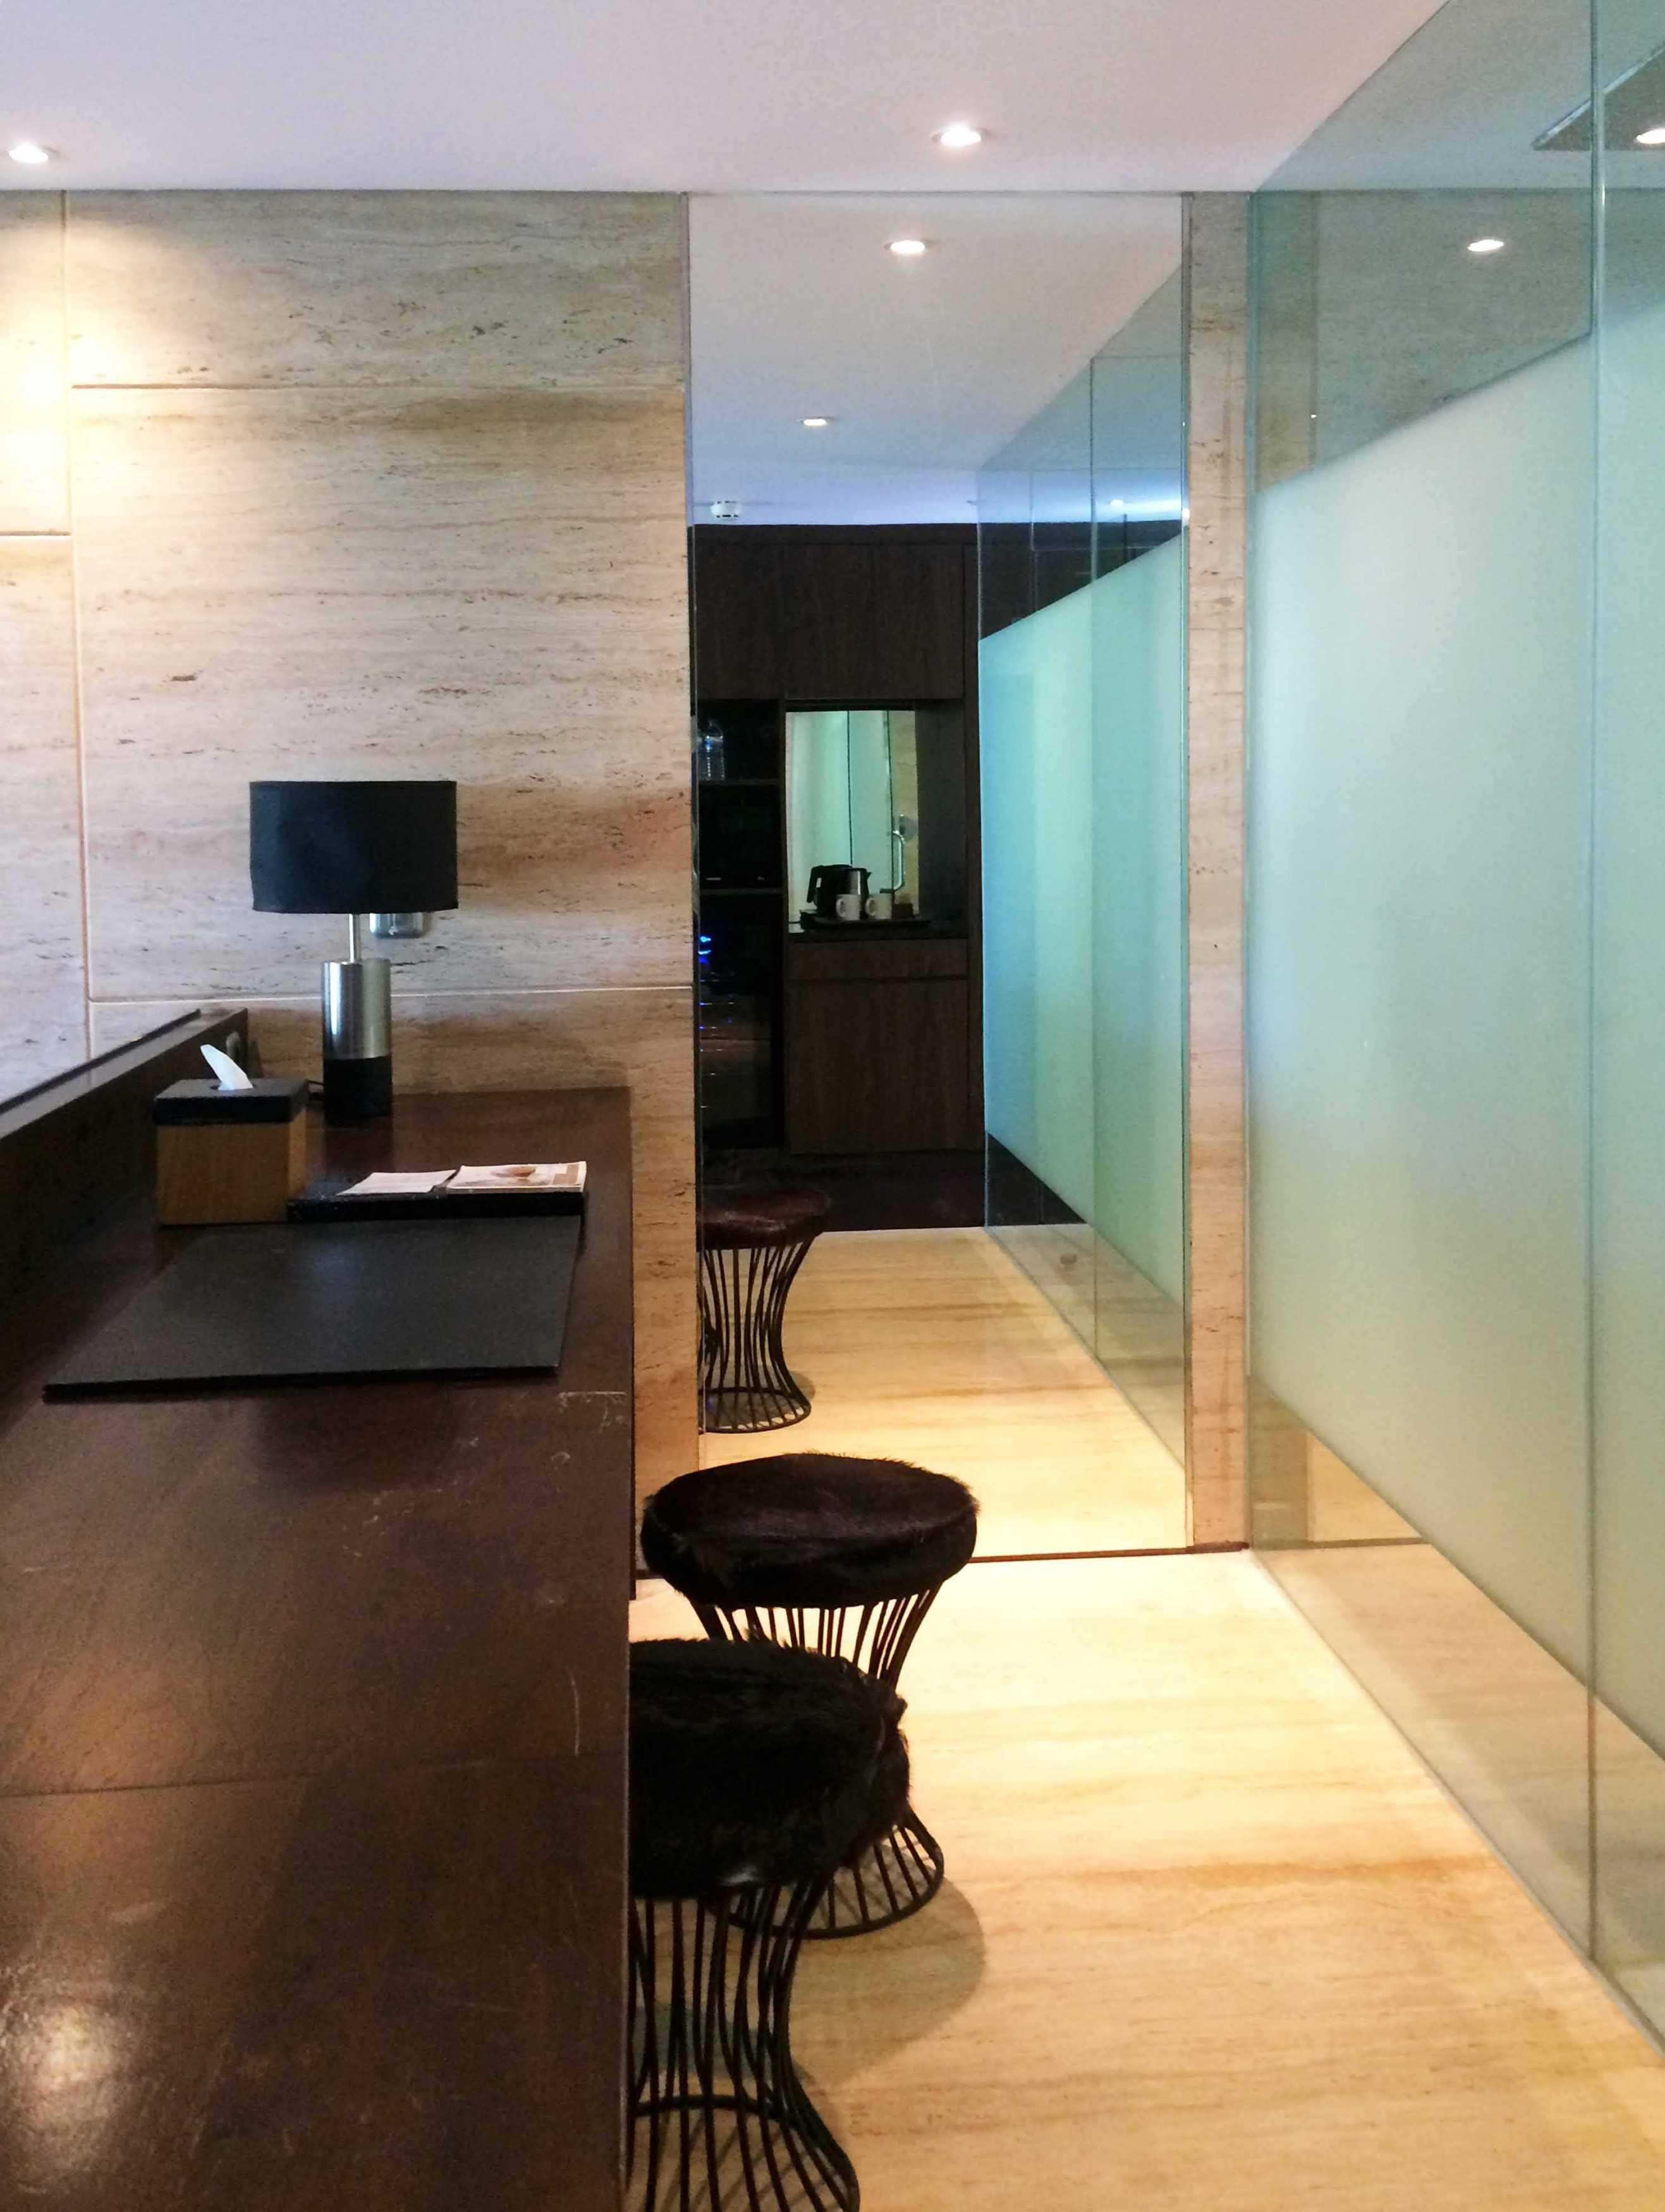 Monokroma Architect Golden Tulip Devinz Skyvilla Seminyak, Bali Seminyak, Bali Interior Hotel Modern  29933